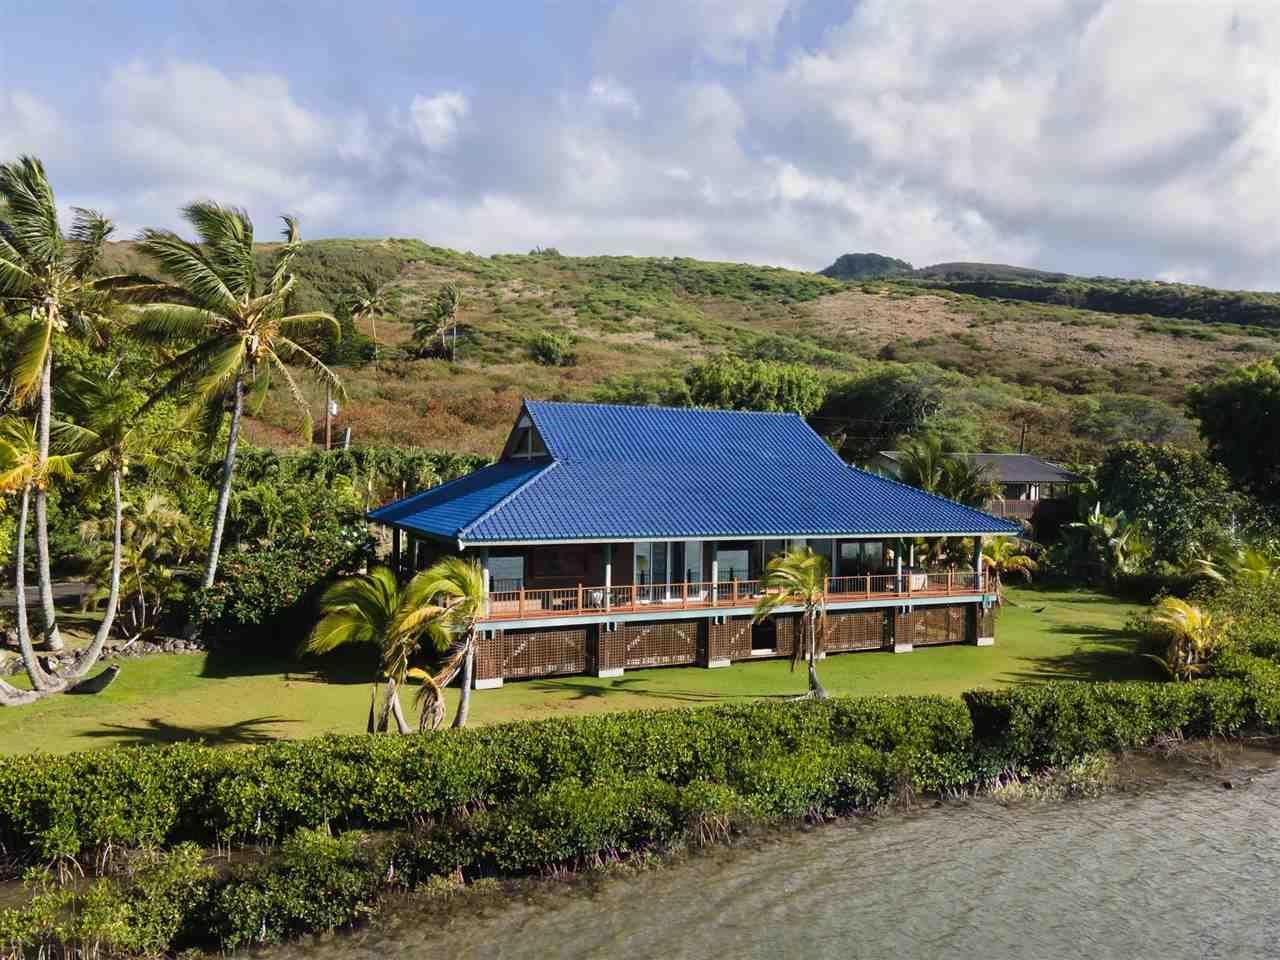 Photo of 8900 Kamehameha V Hwy, Kaunakakai, HI 96748 (MLS # 388010)